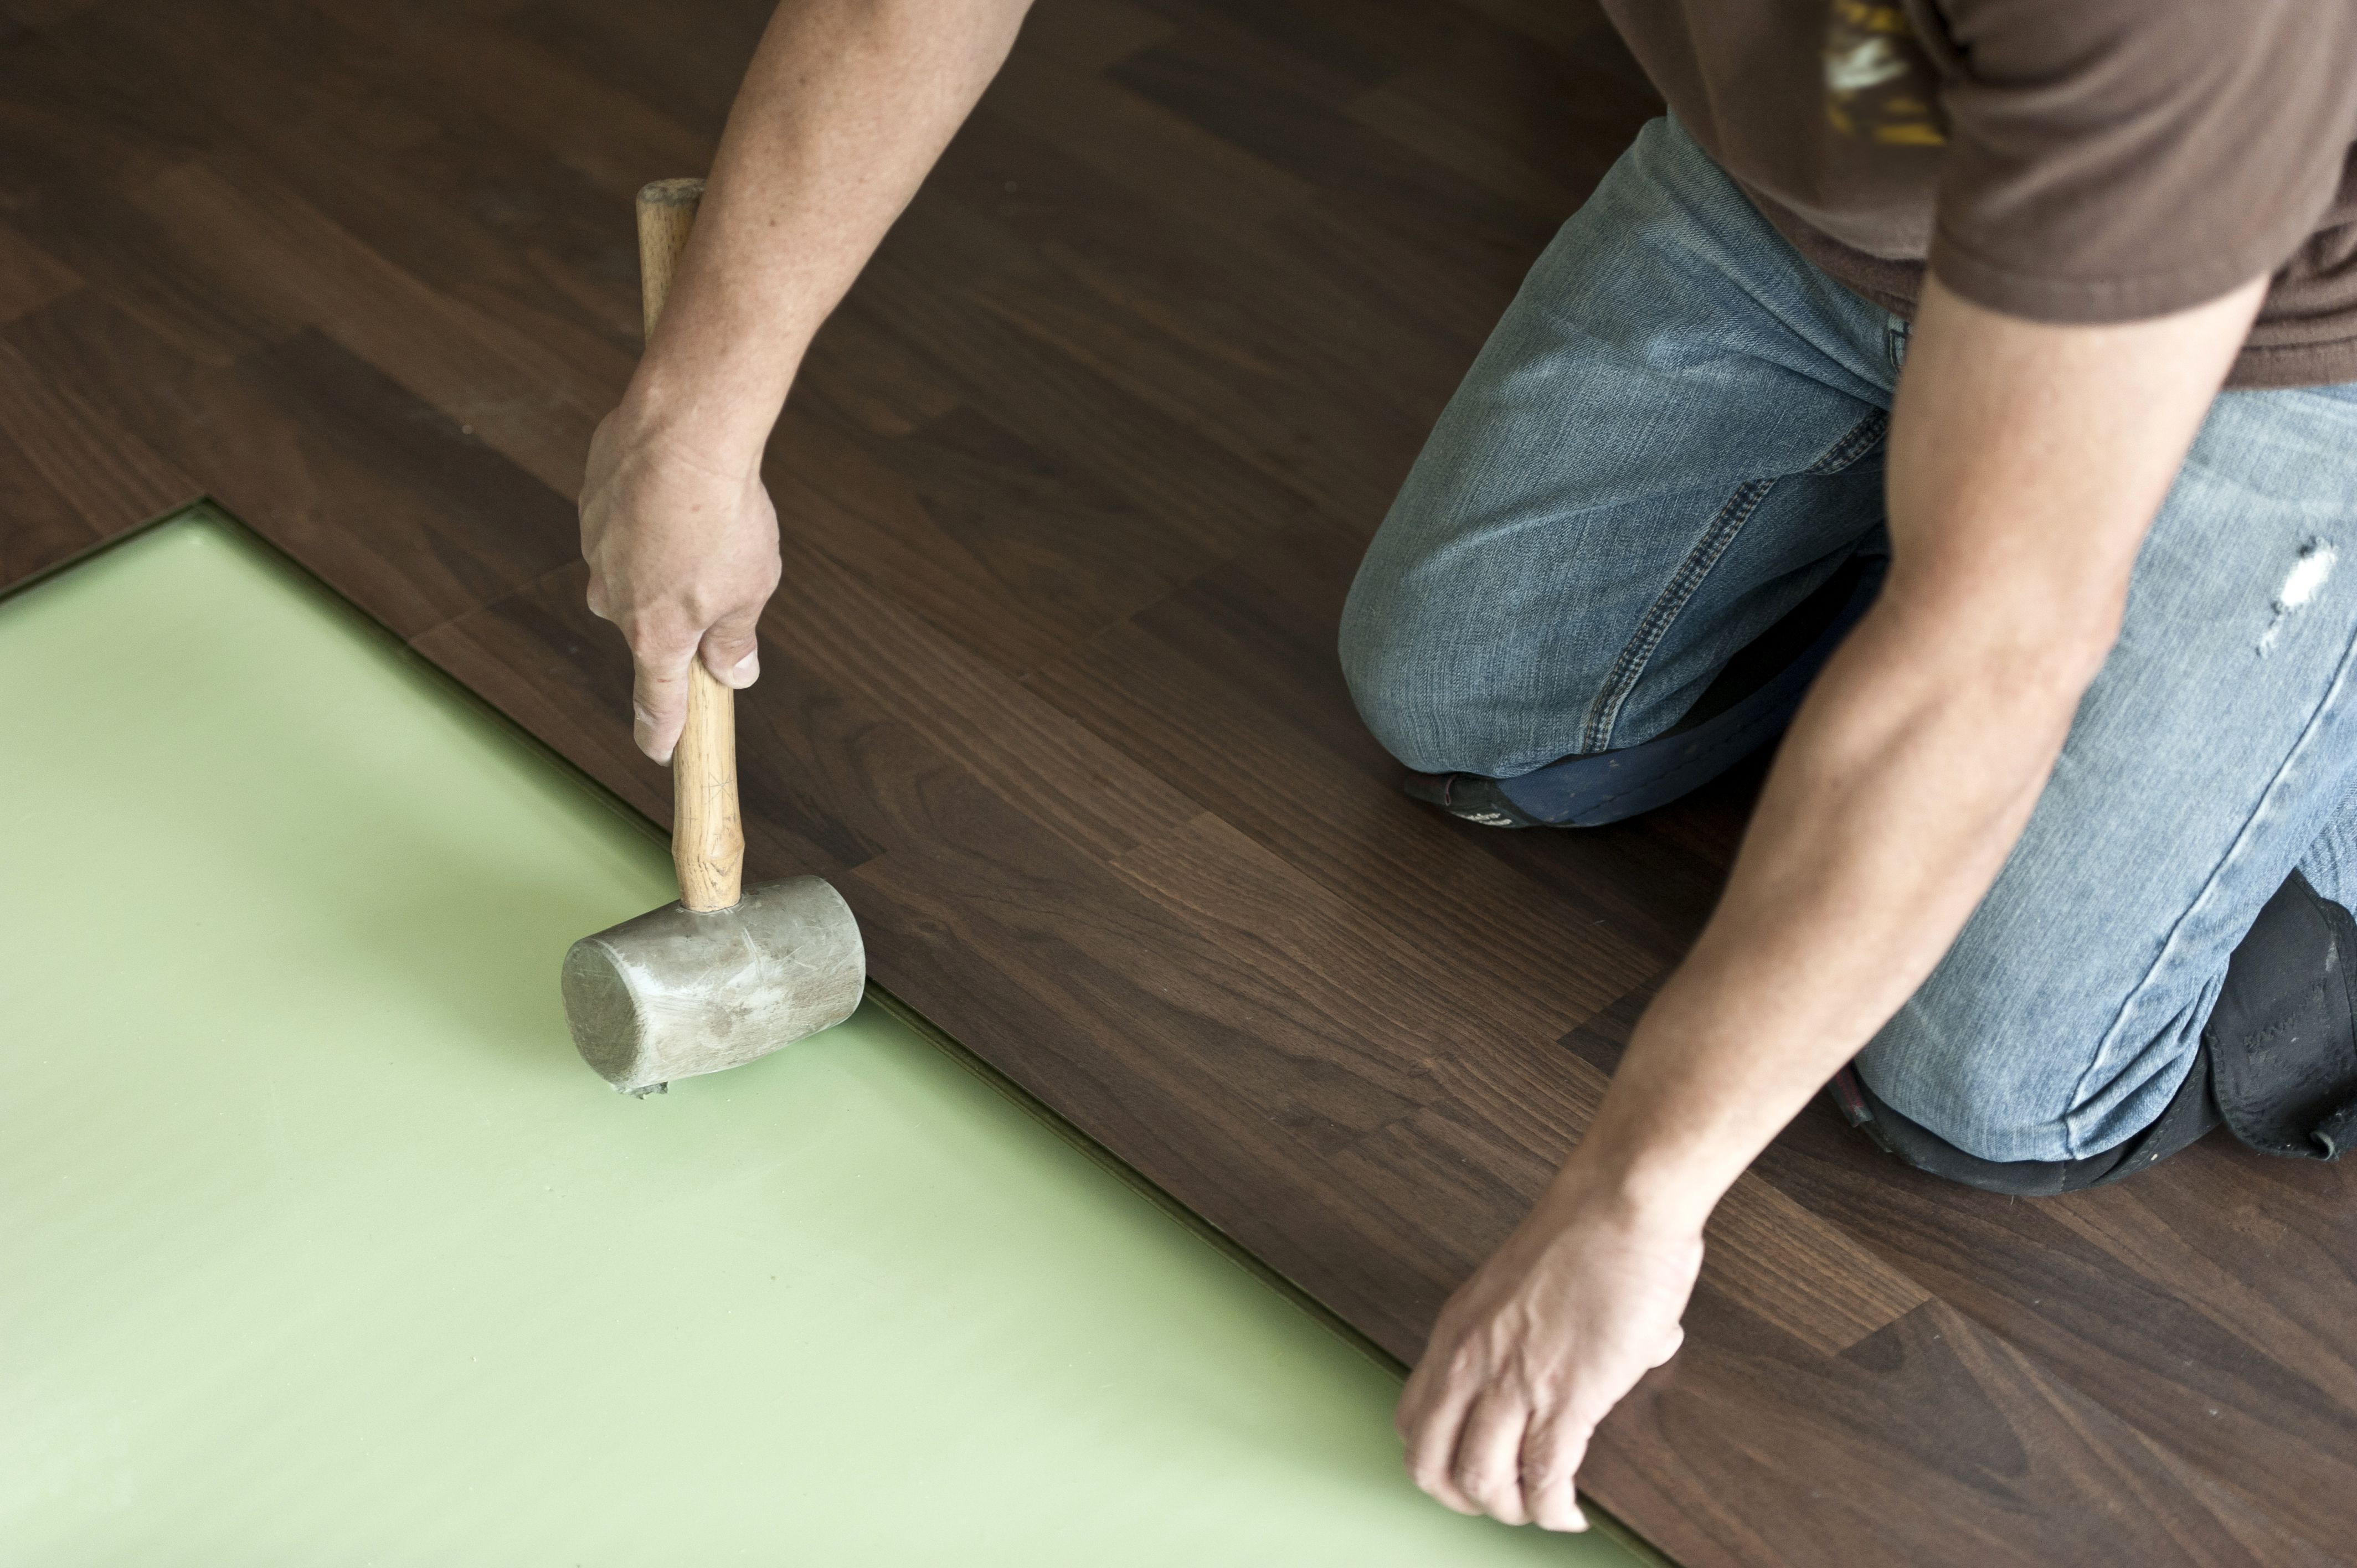 10 Perfect 7 Inch Hardwood Flooring 2021 free download 7 inch hardwood flooring of can a foam pad be use under solid hardwood flooring regarding installing hardwood floor 155149312 57e967d45f9b586c35ade84a